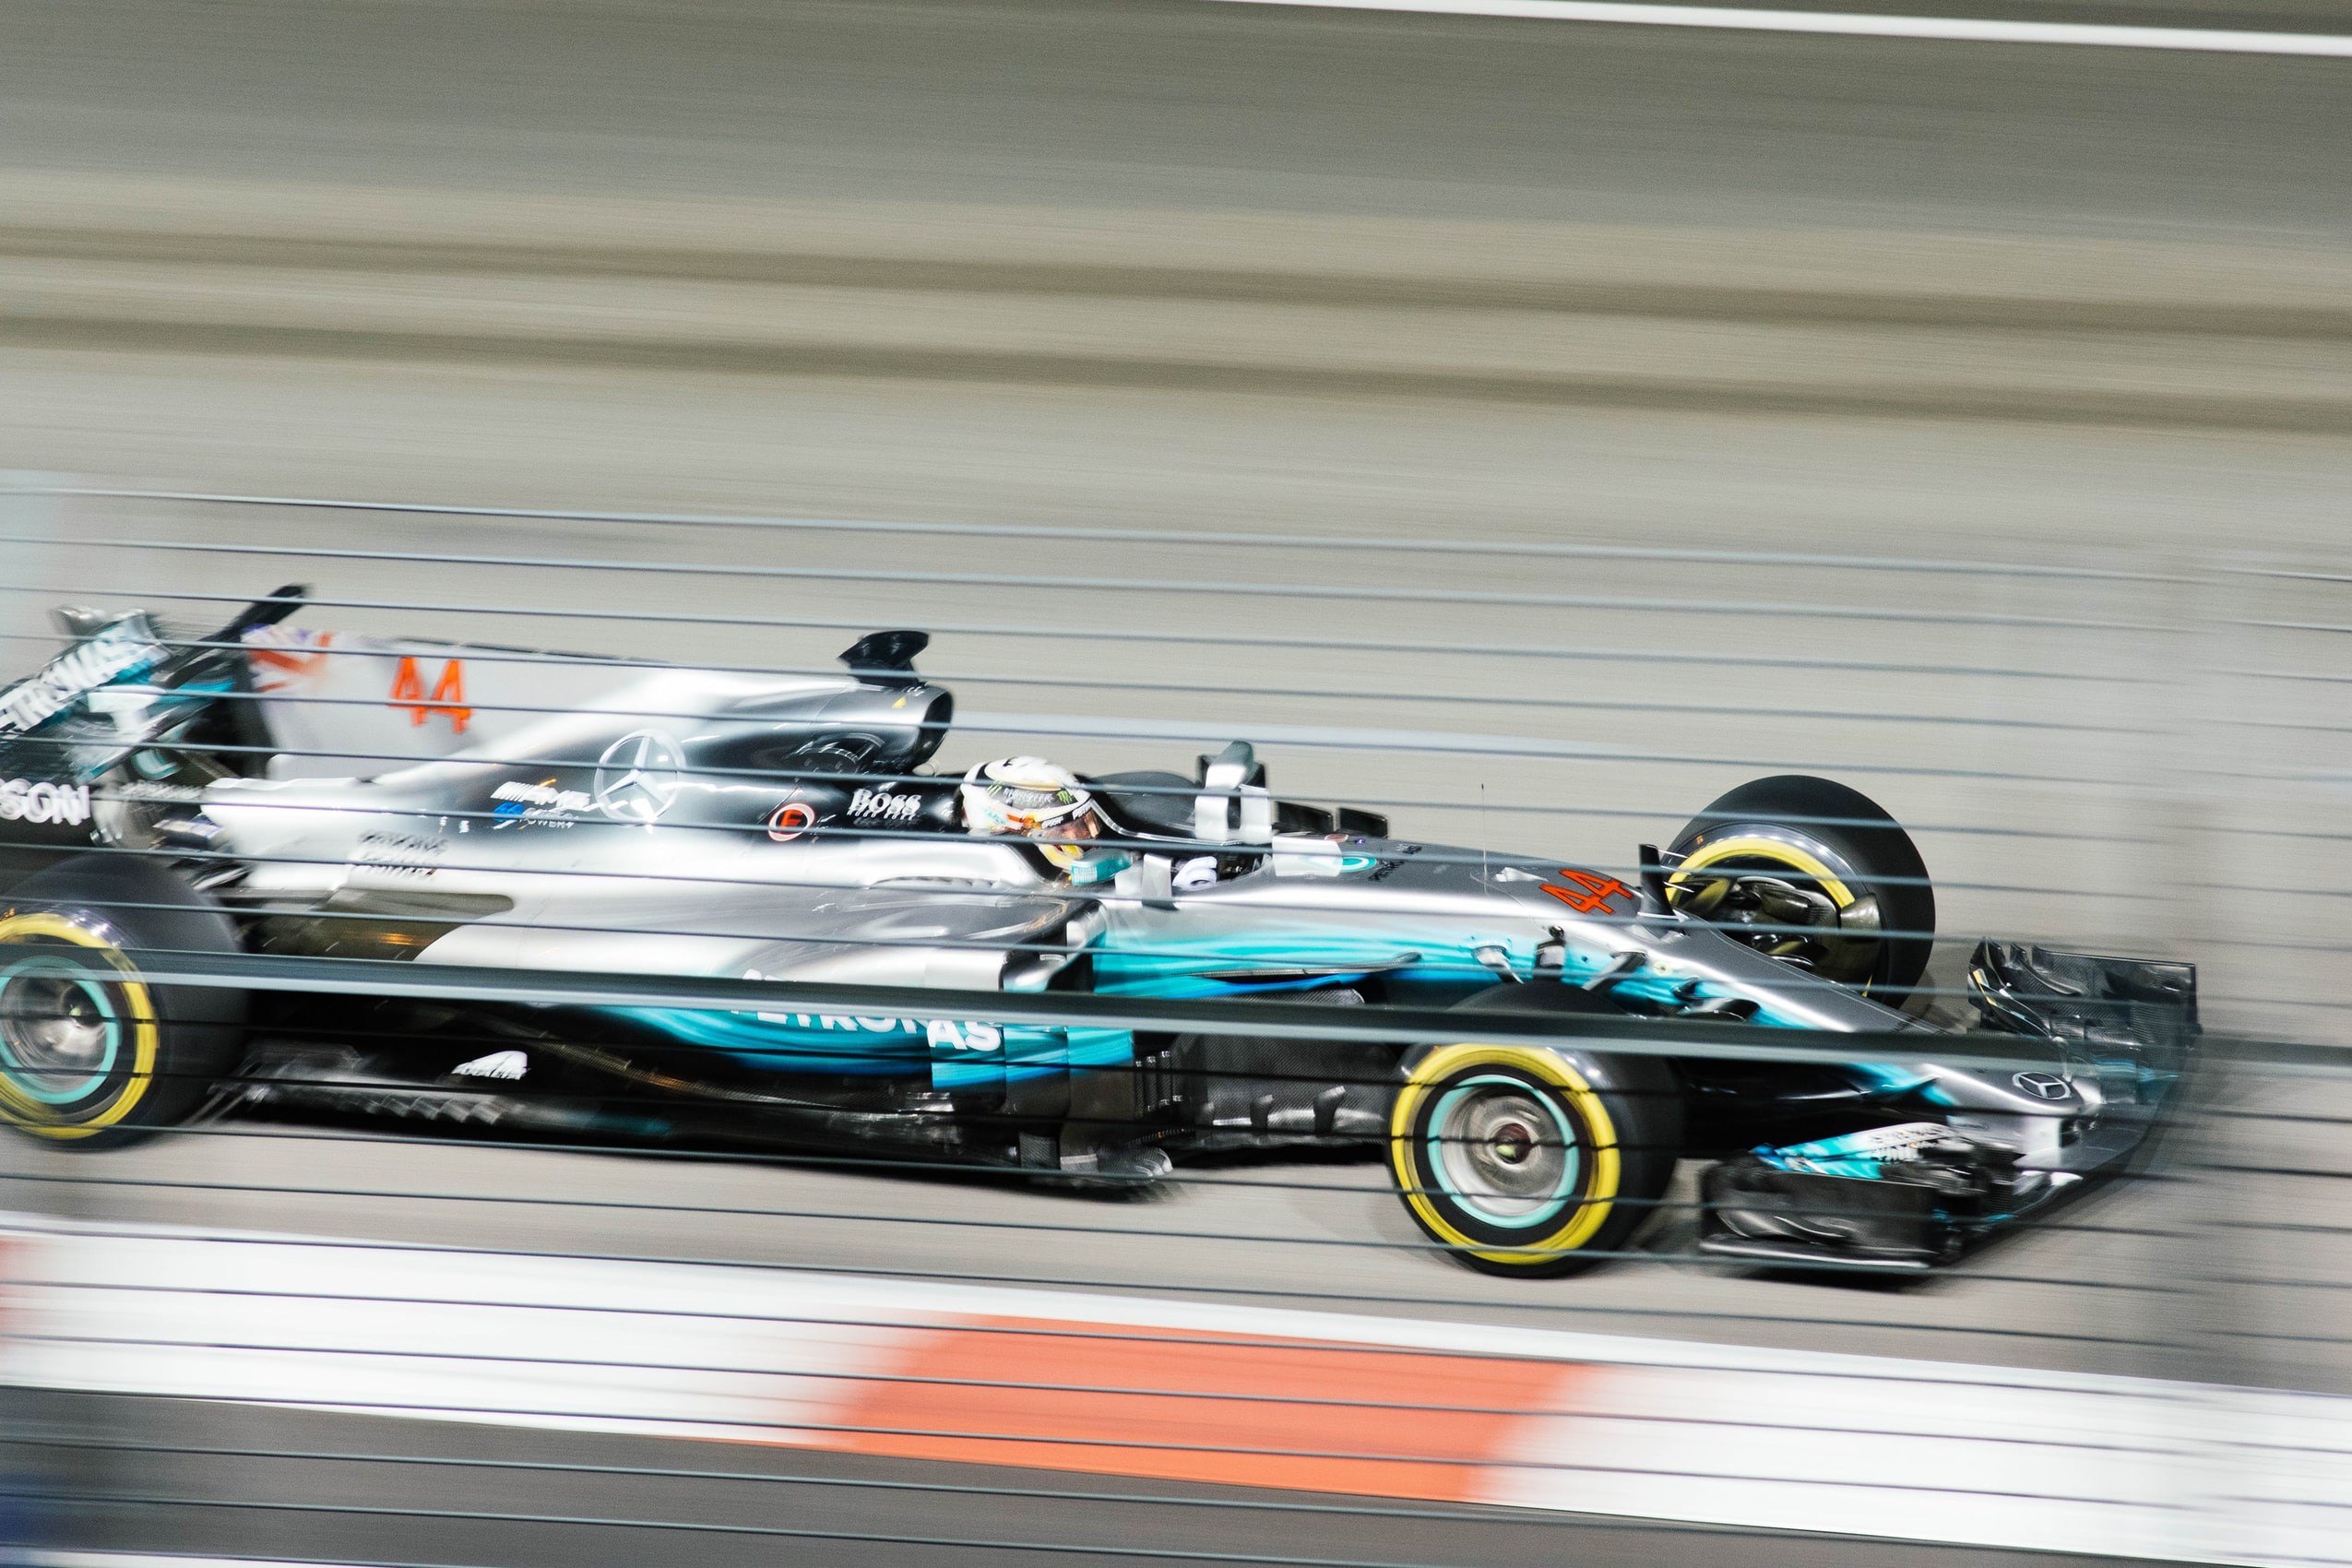 Racecar in motion